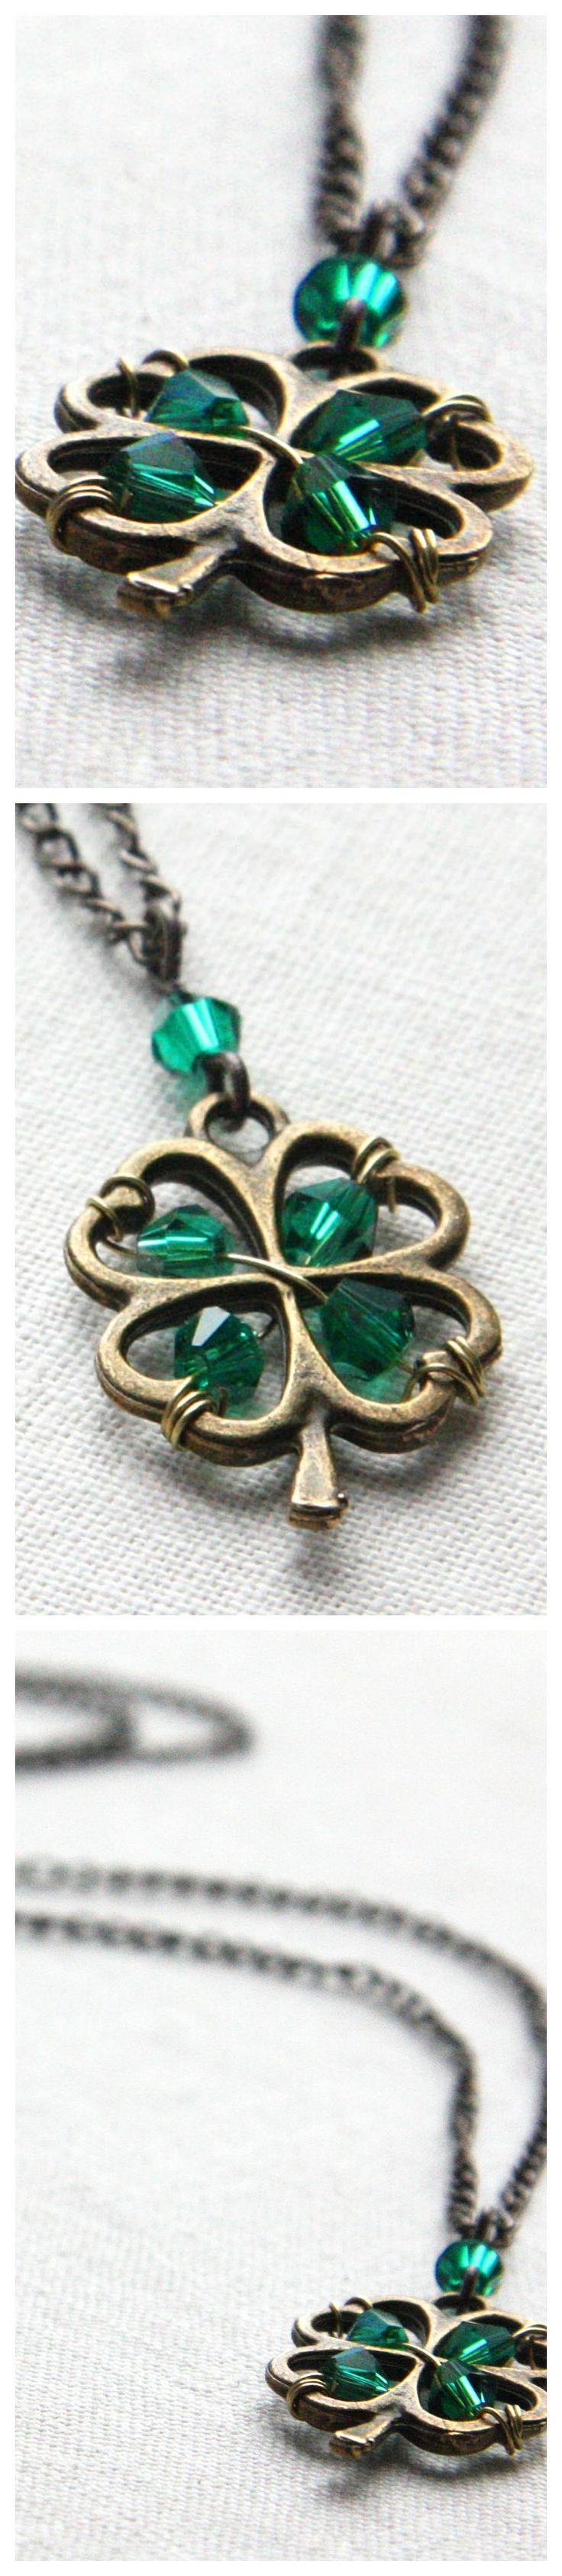 Green lucky shamrock necklace four leaf clover charm emerald green - Four Leaf Clover Pendant Irish Shamrock For Good Luck Emerald Green Crystal Necklace